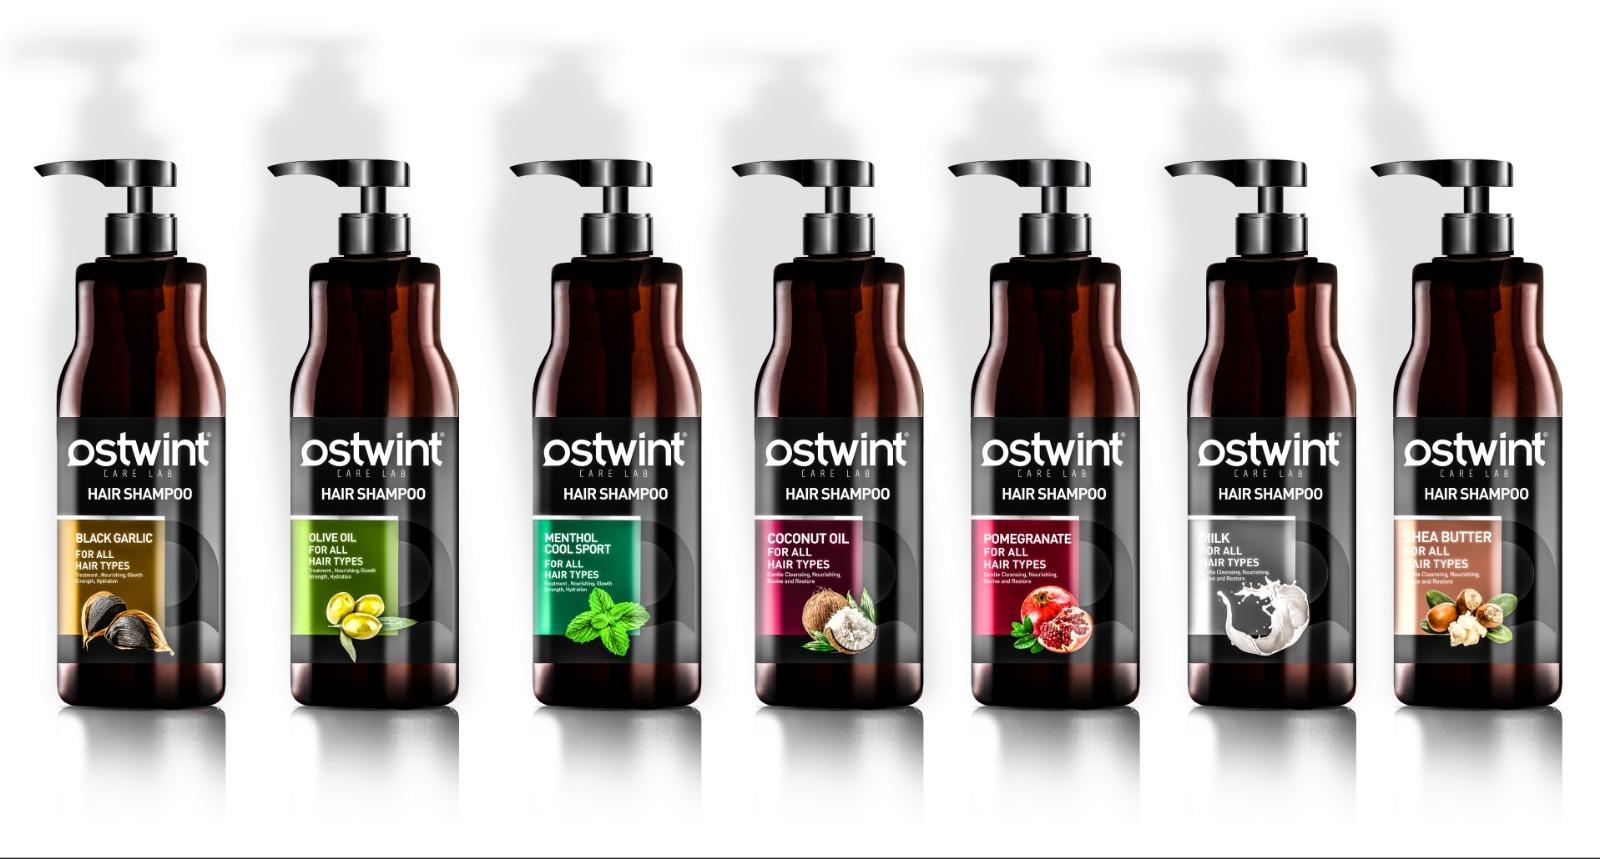 OSTWINT مجموعة شامبو الشعر الملصق الخاص